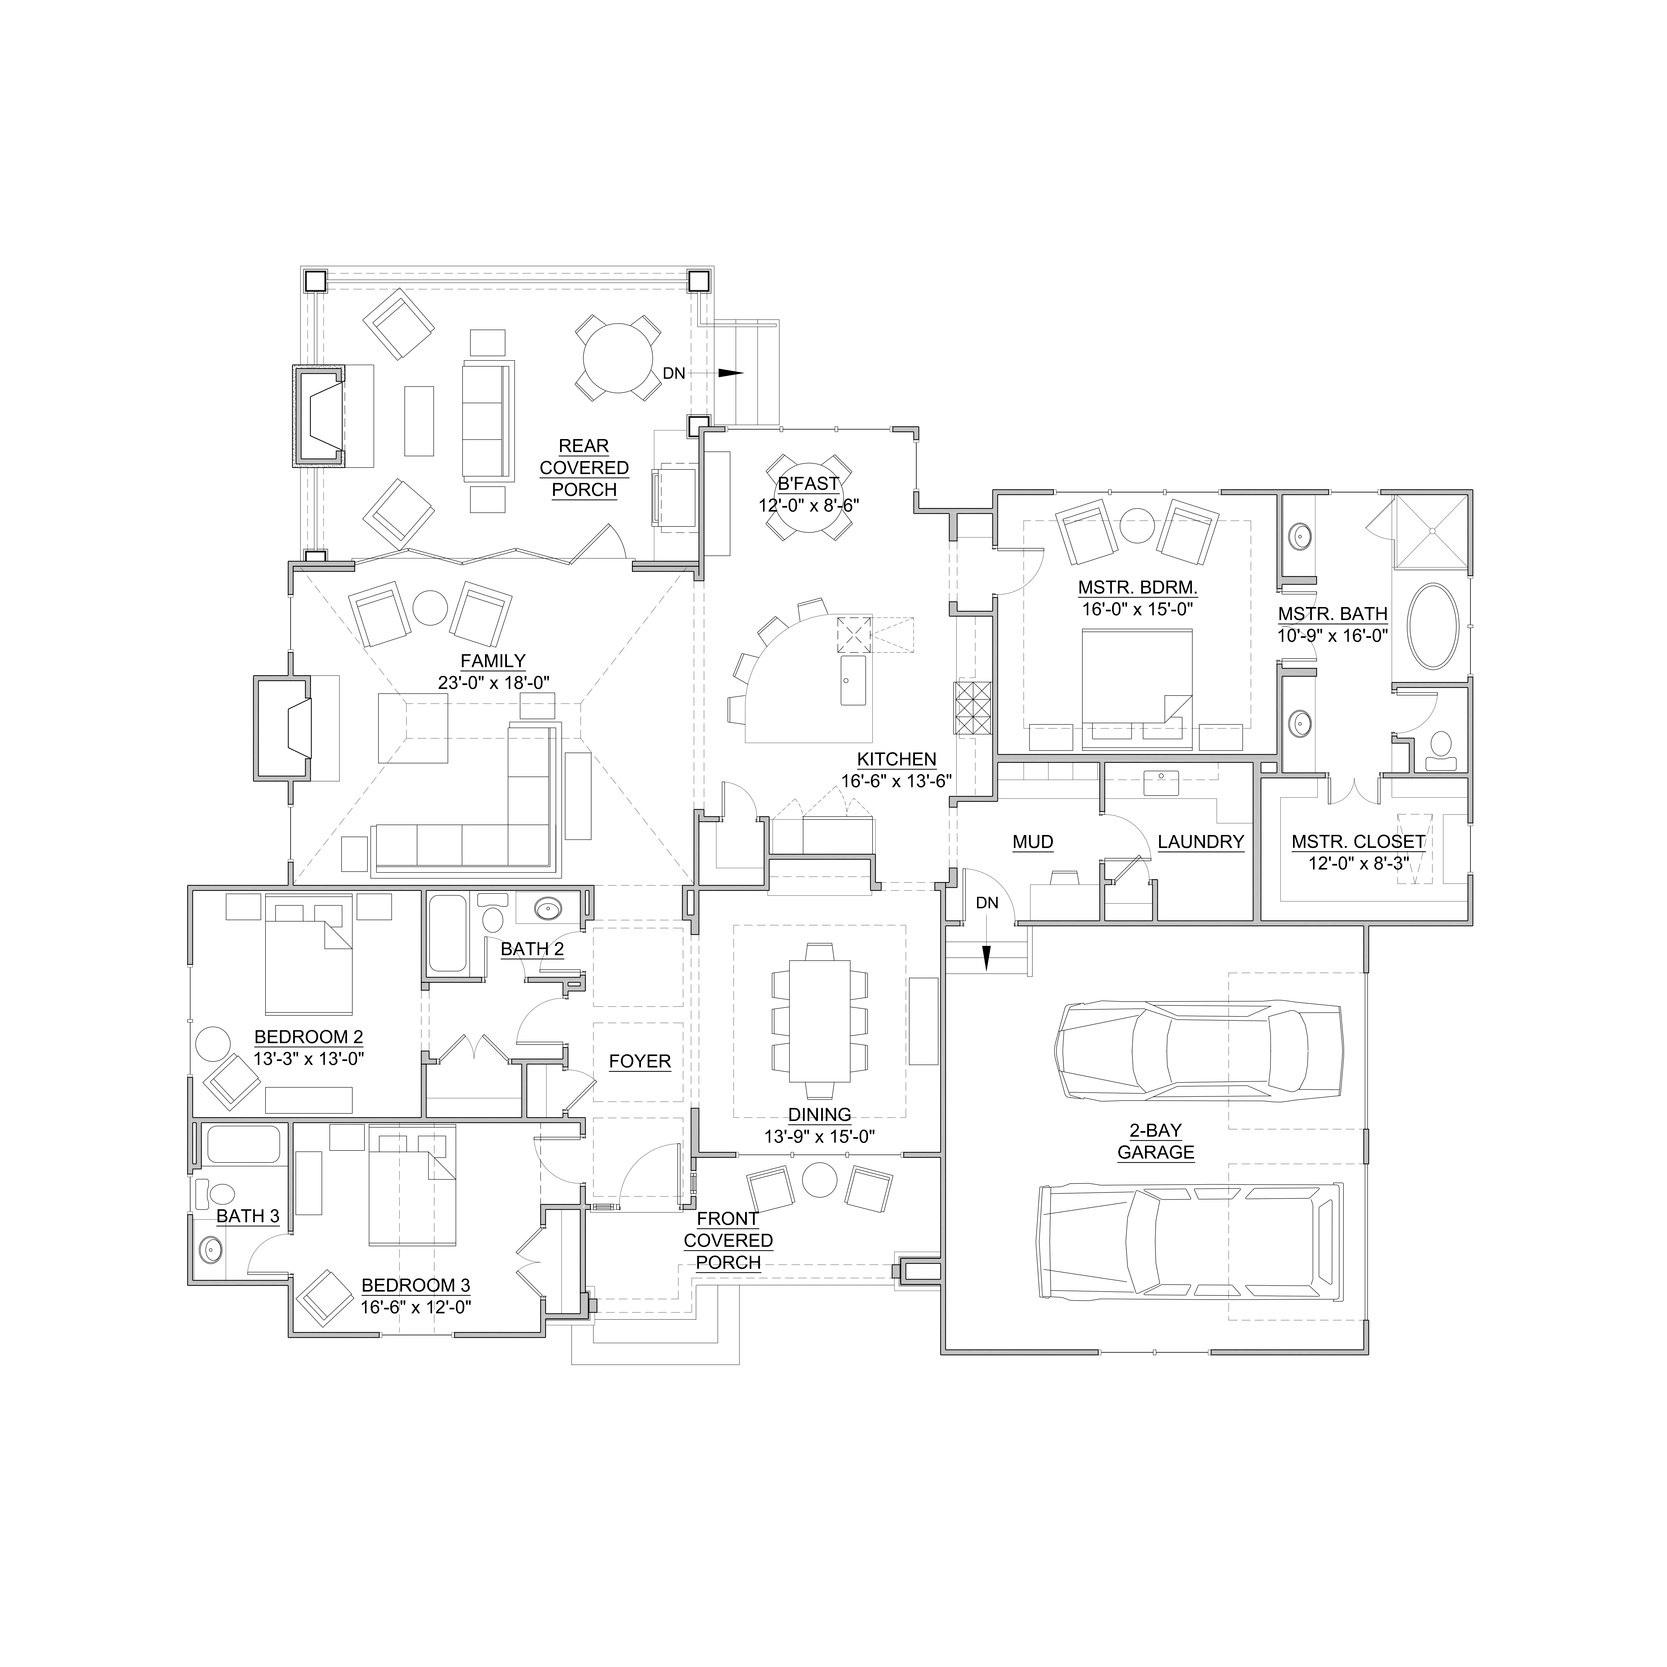 Riverchase_Avila+A+CRAWL_%282%29+First+Floor+Plan+%5B24x36%5D.jpg